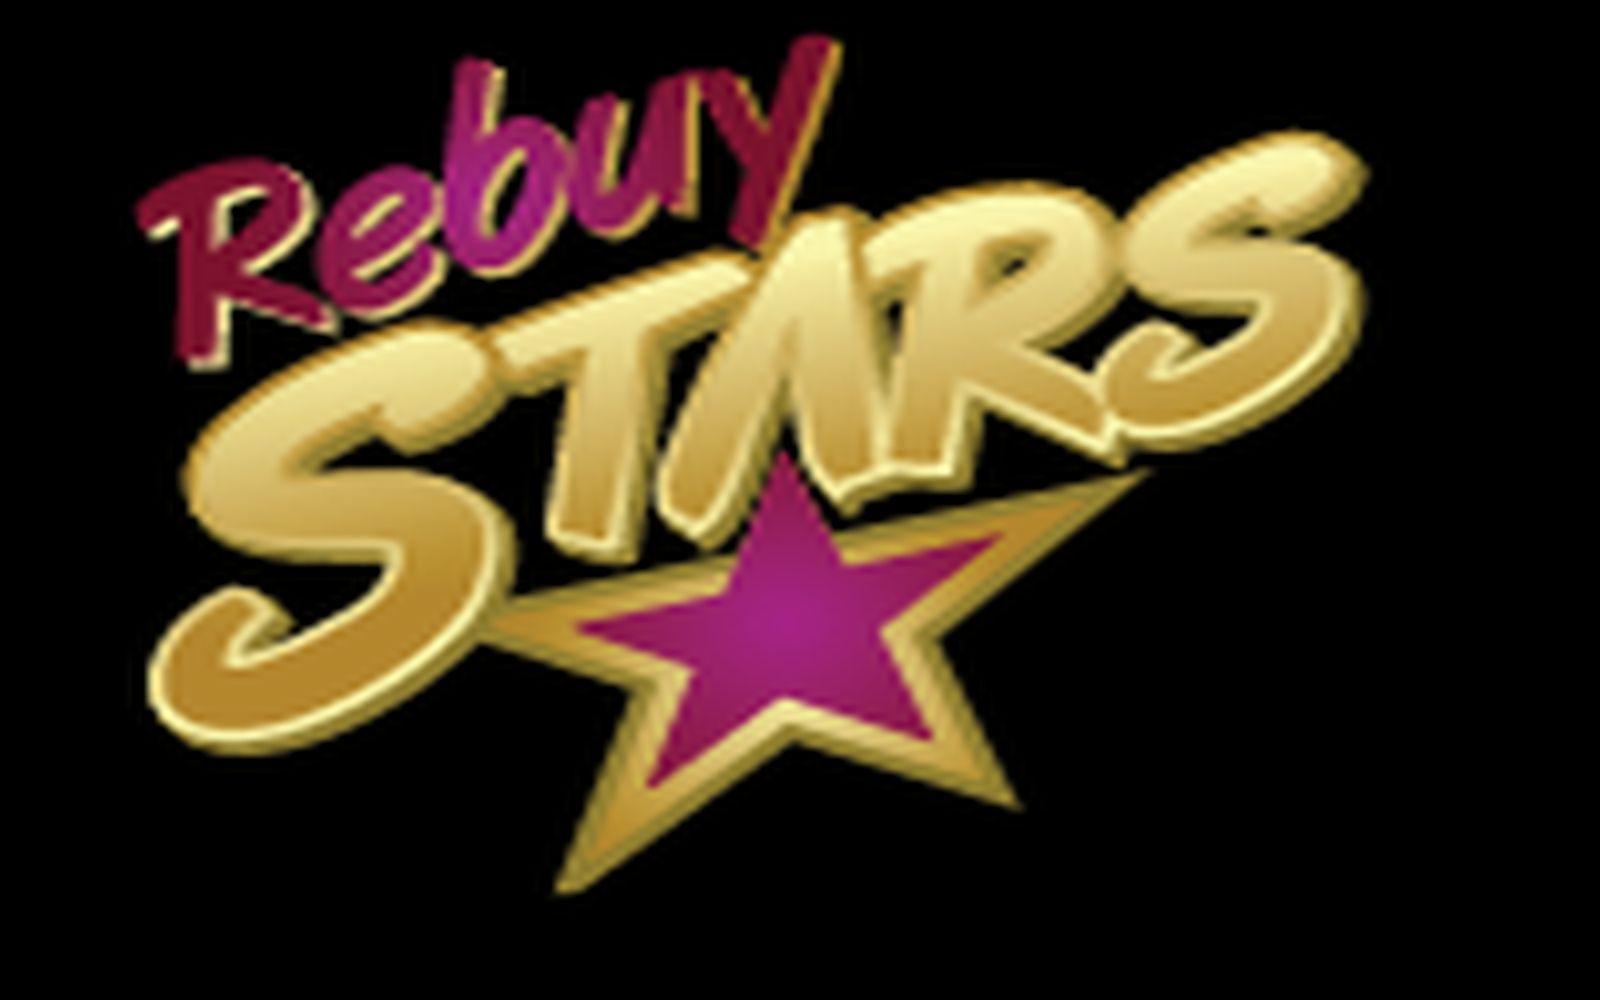 Rebuy Stars Kaldno